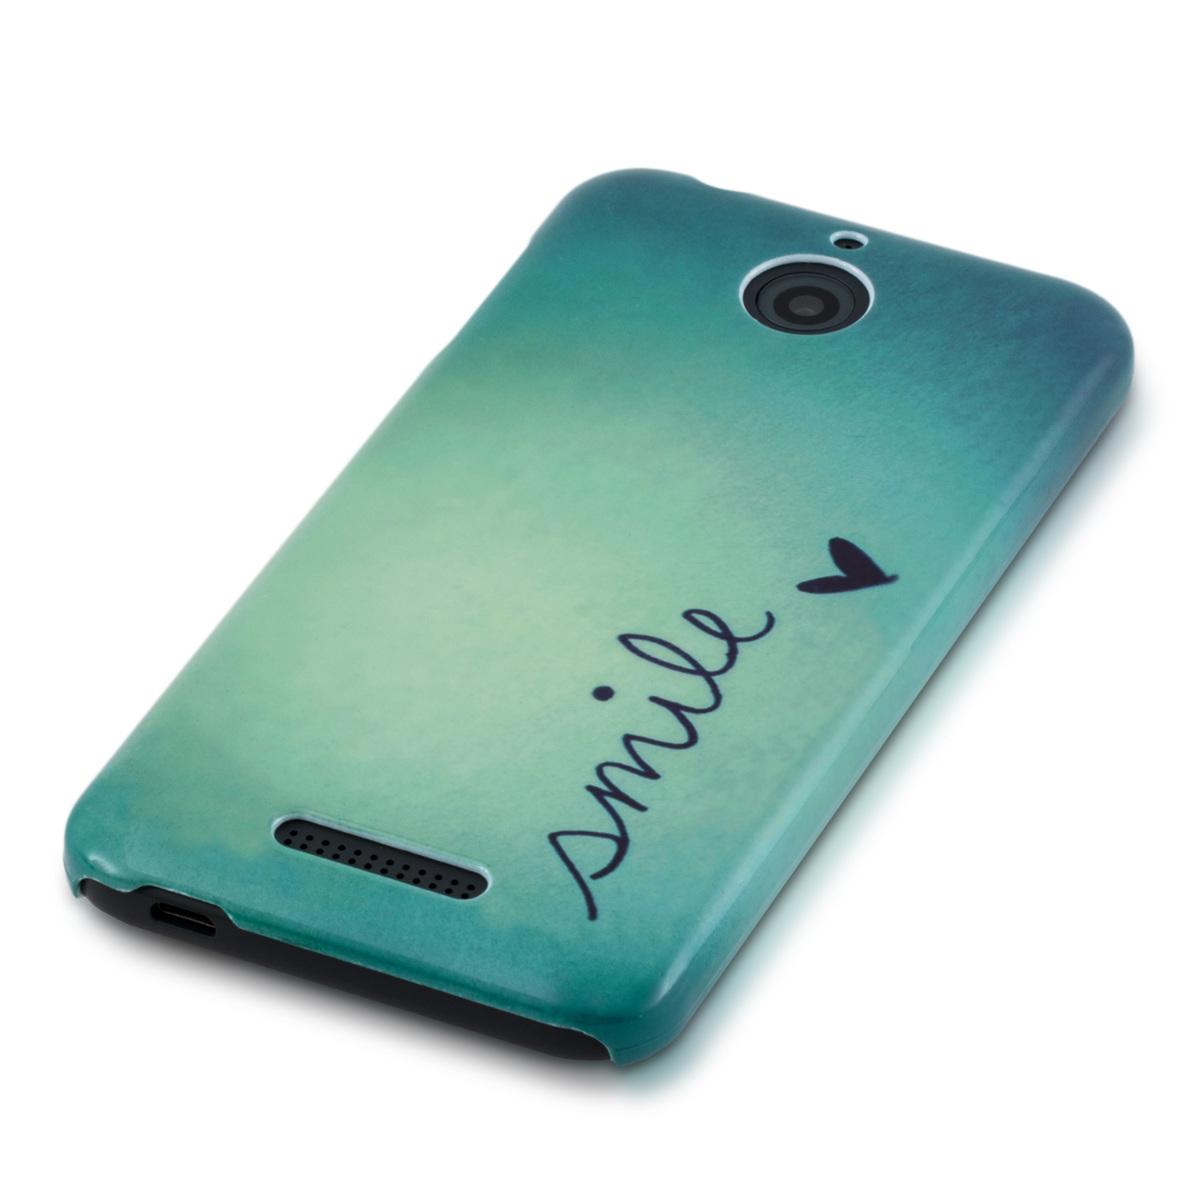 Kwmobile Hard Cover Design For Htc Desire 510 Case Back Shell Bumper Mobile Ebay